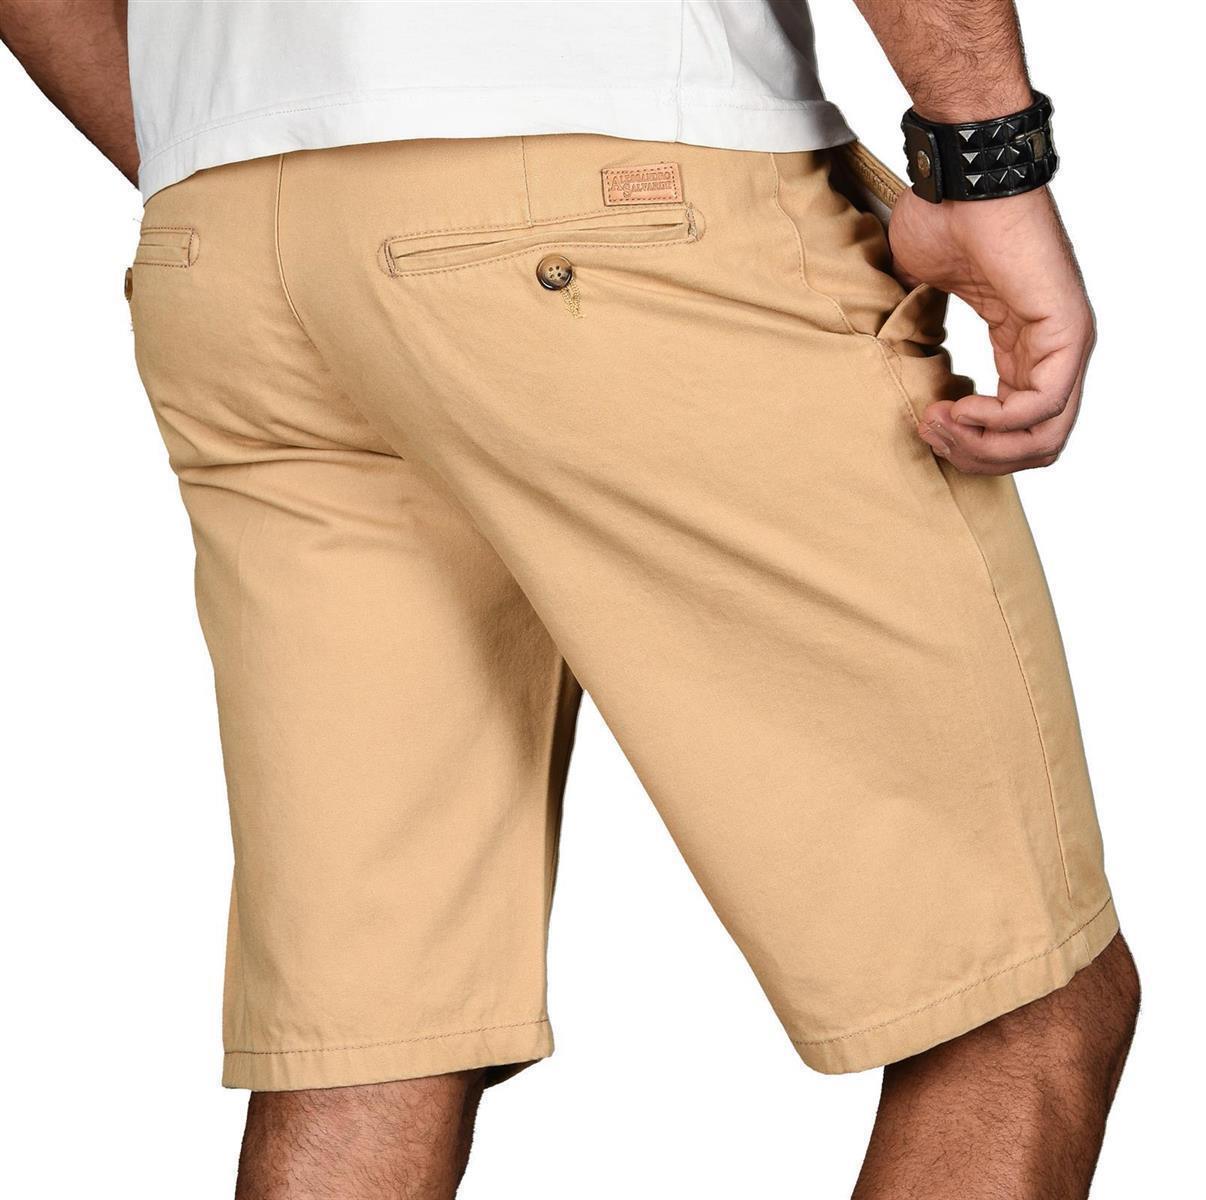 A-Salvarini-Herren-Shorts-kurze-Sommer-Hose-mit-Guertel-Short-Bermuda-NEU-AS096 Indexbild 27